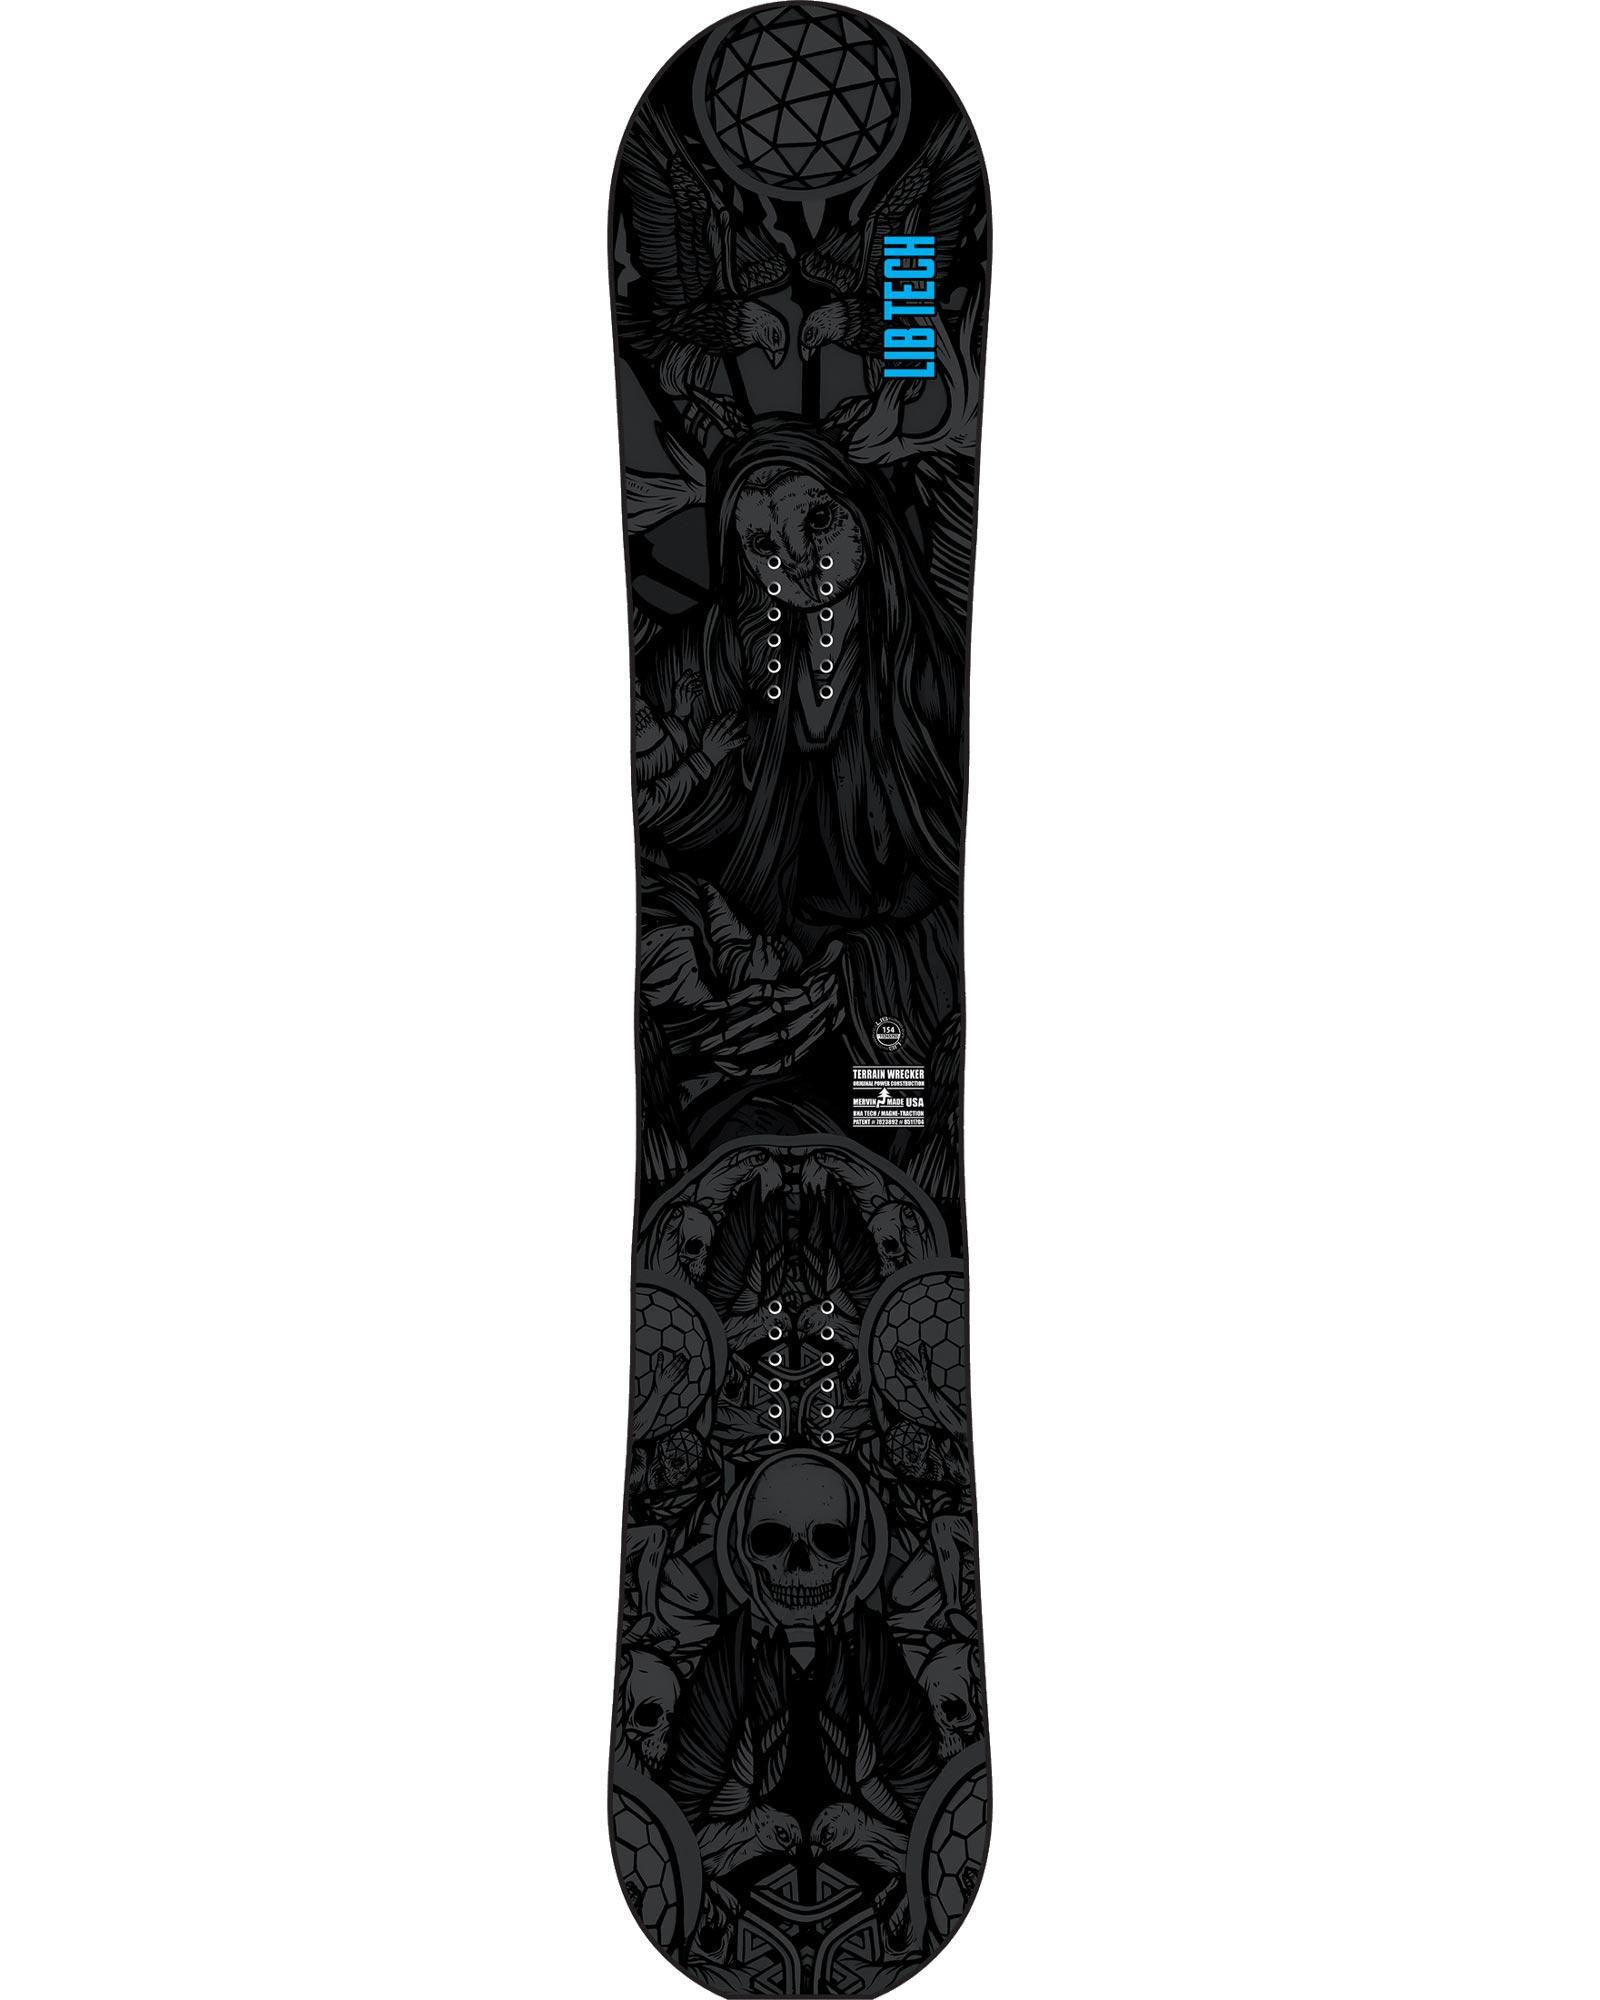 Lib Tech Men's Terrain Wrecker Snowboard 2020 / 2021 0